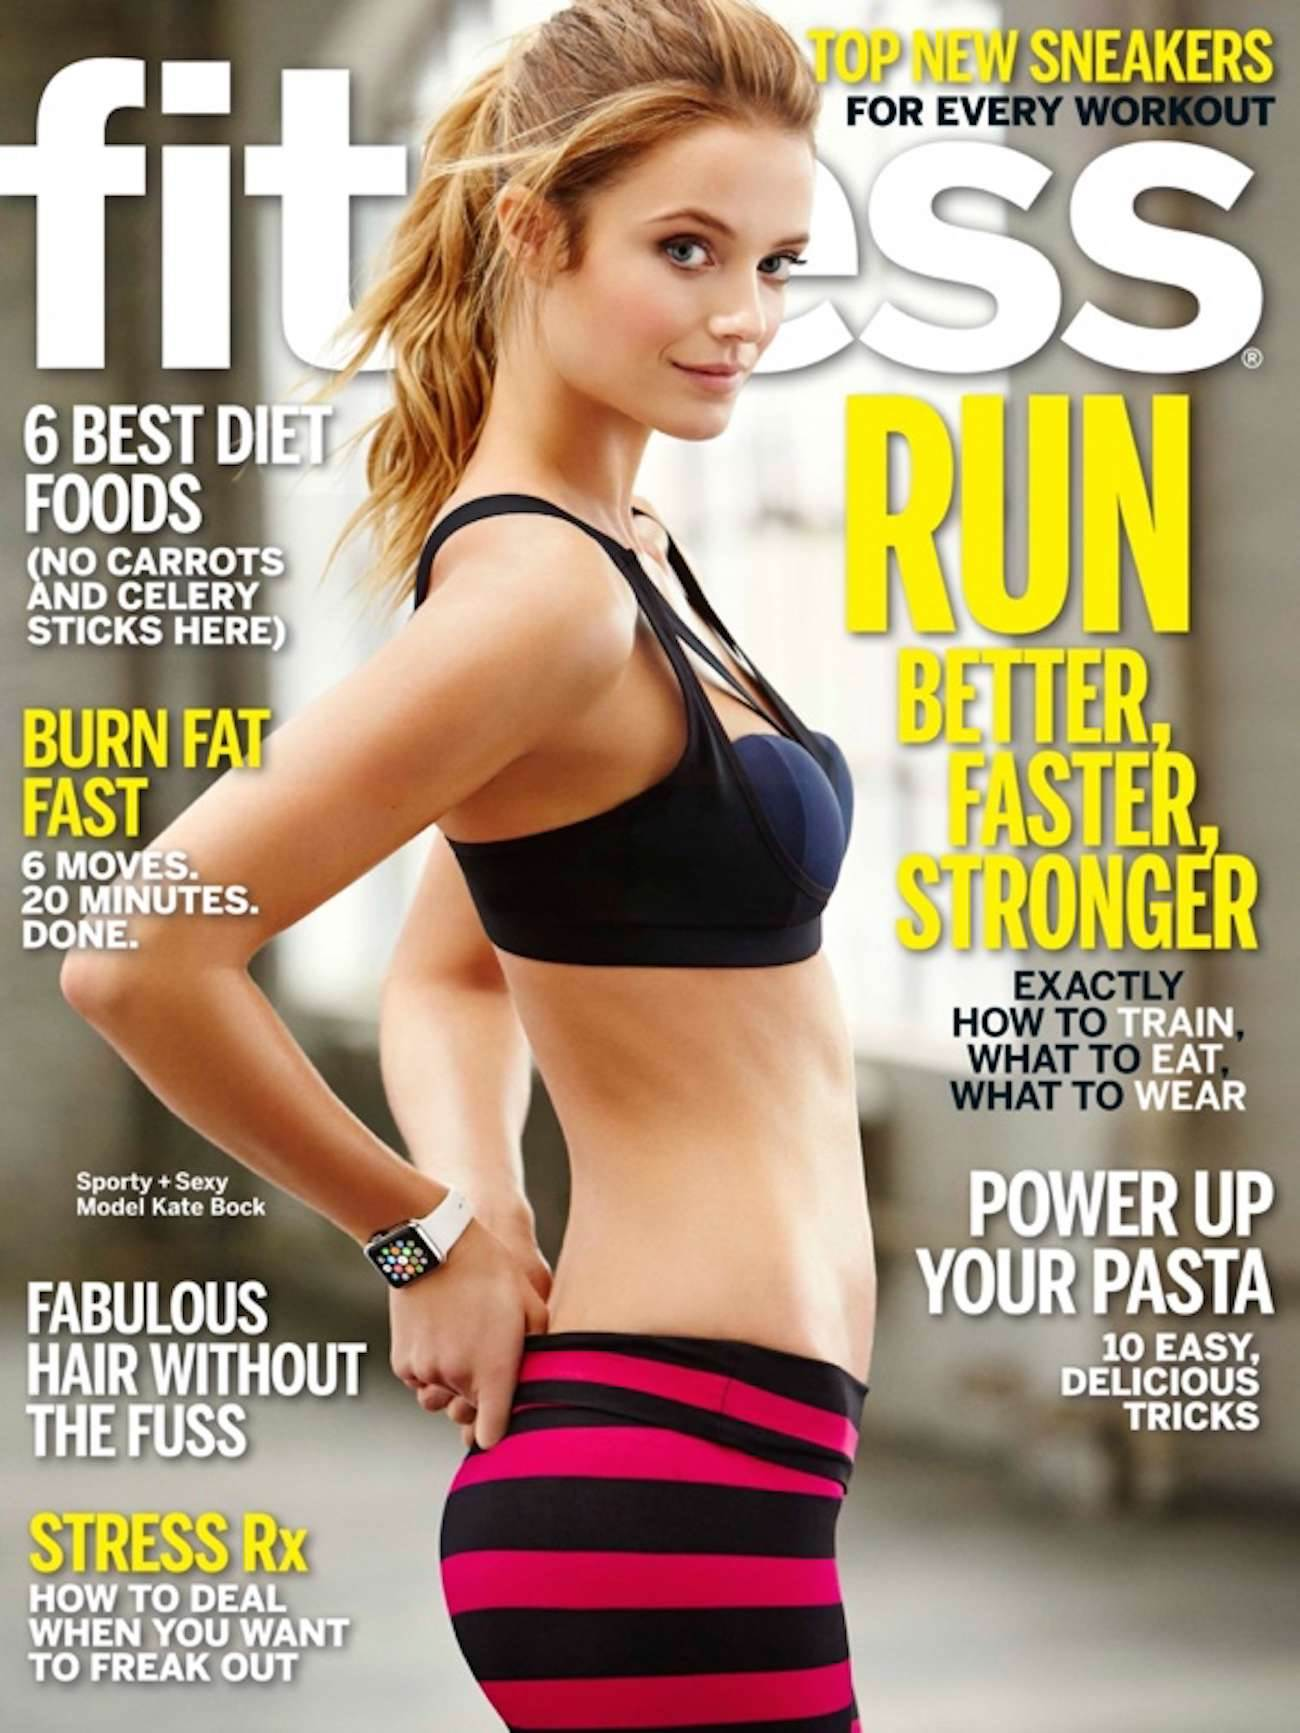 Ifitnessmagazinecover